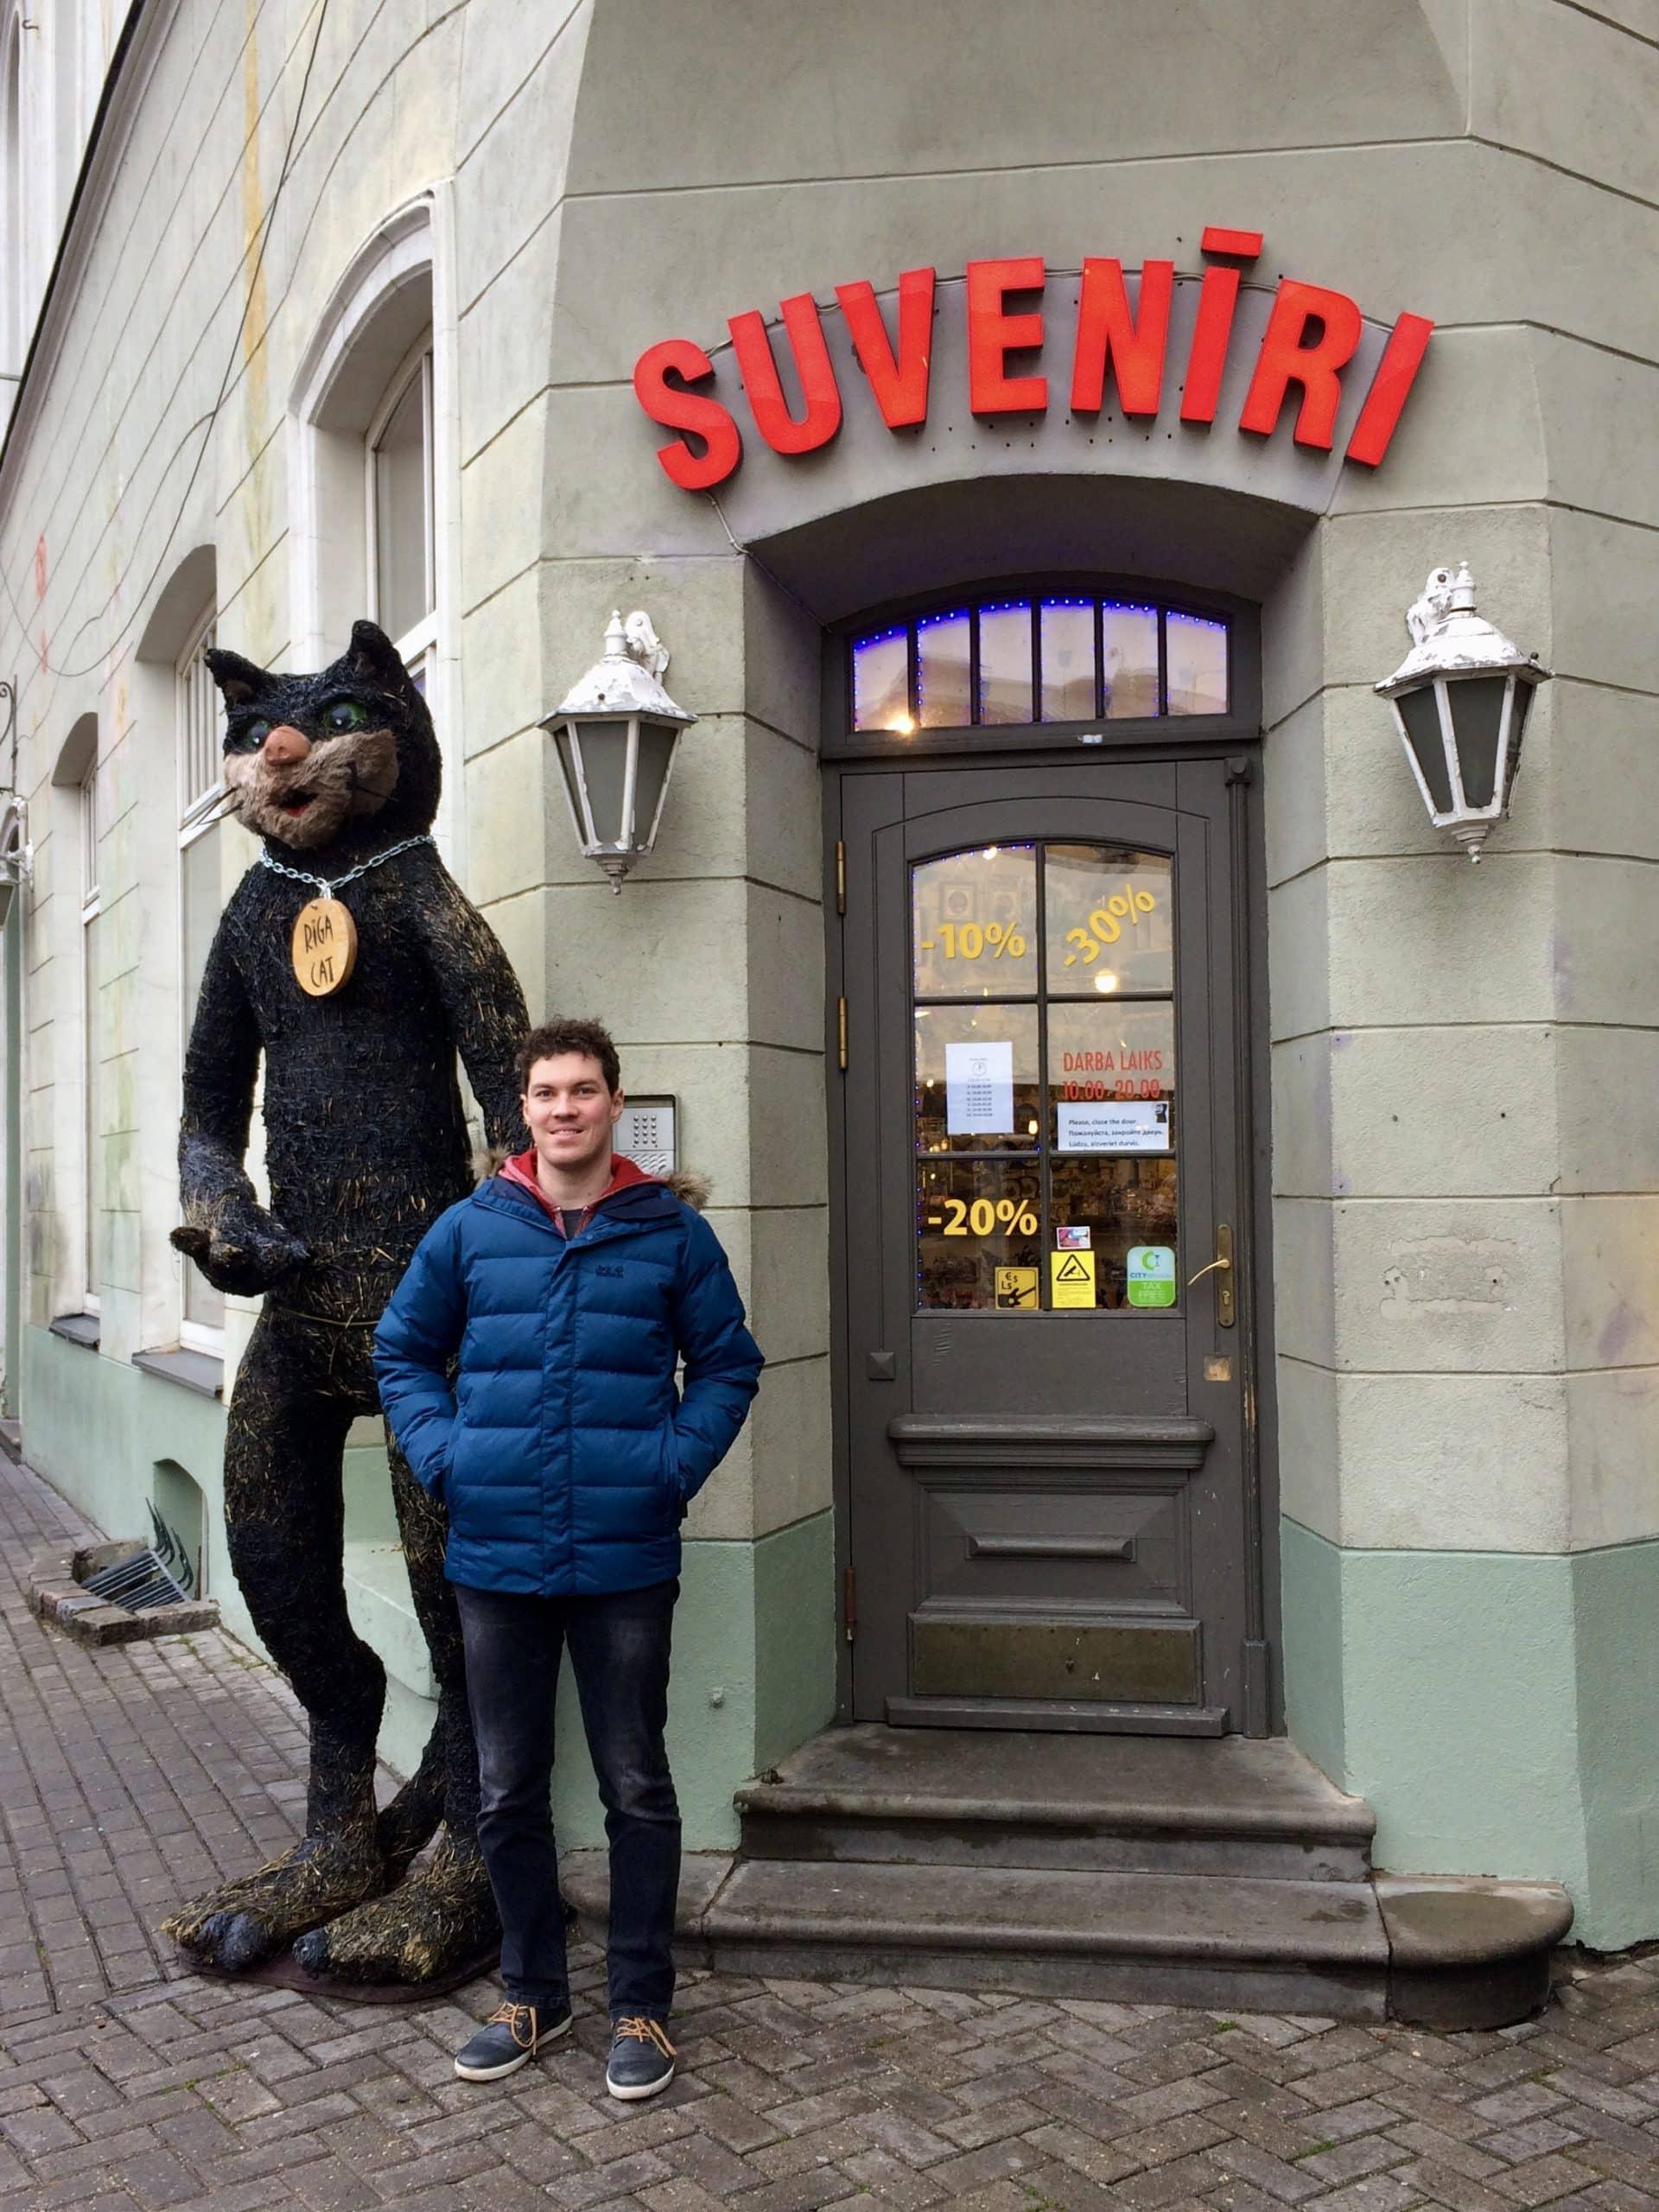 48 hours in Riga: My tips for Latvia's capital city